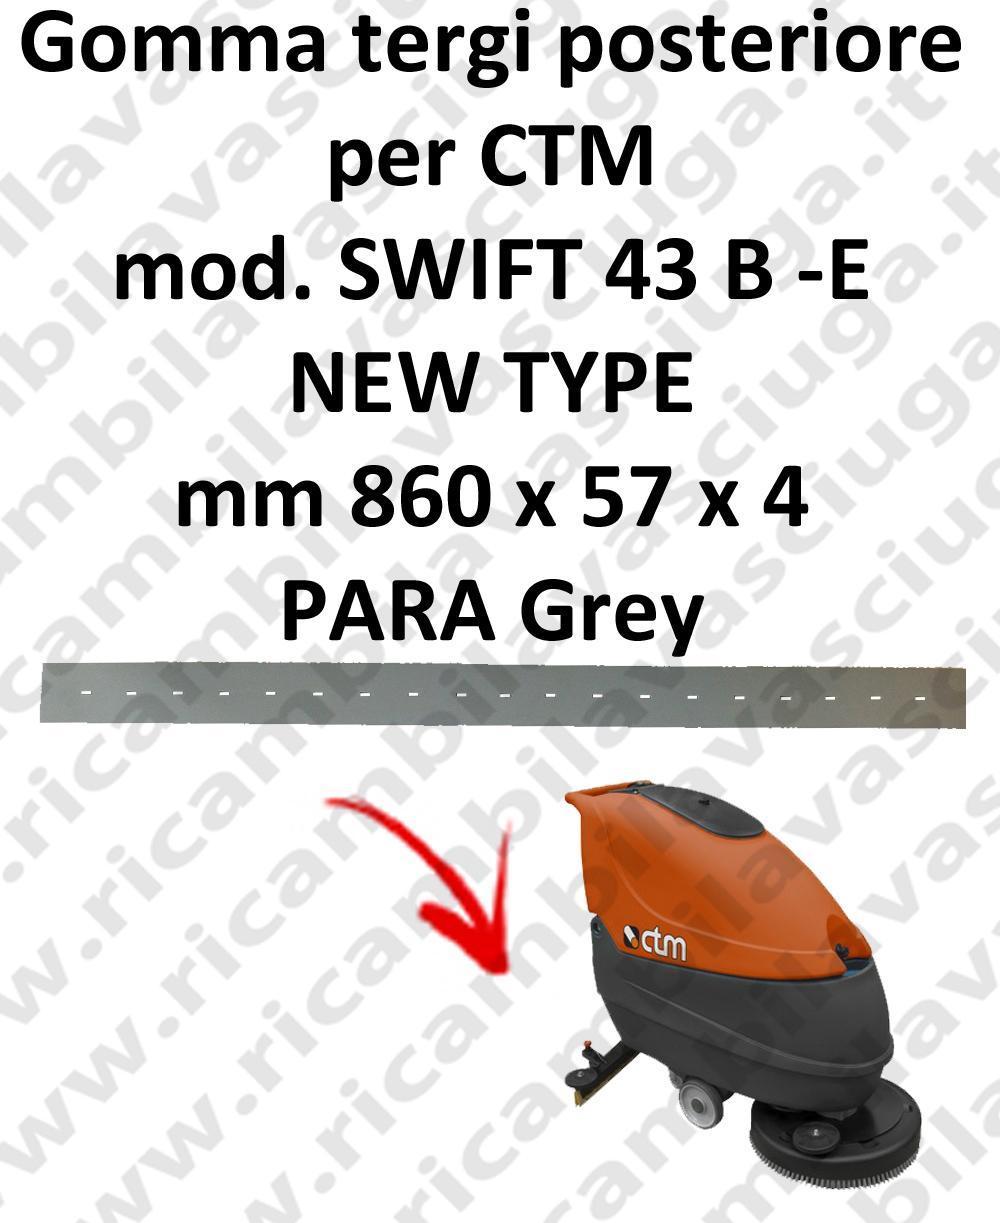 SWIFT 43 B - ünd NEW TYPE Hinten sauglippen für scheuersaugmaschinen CTM